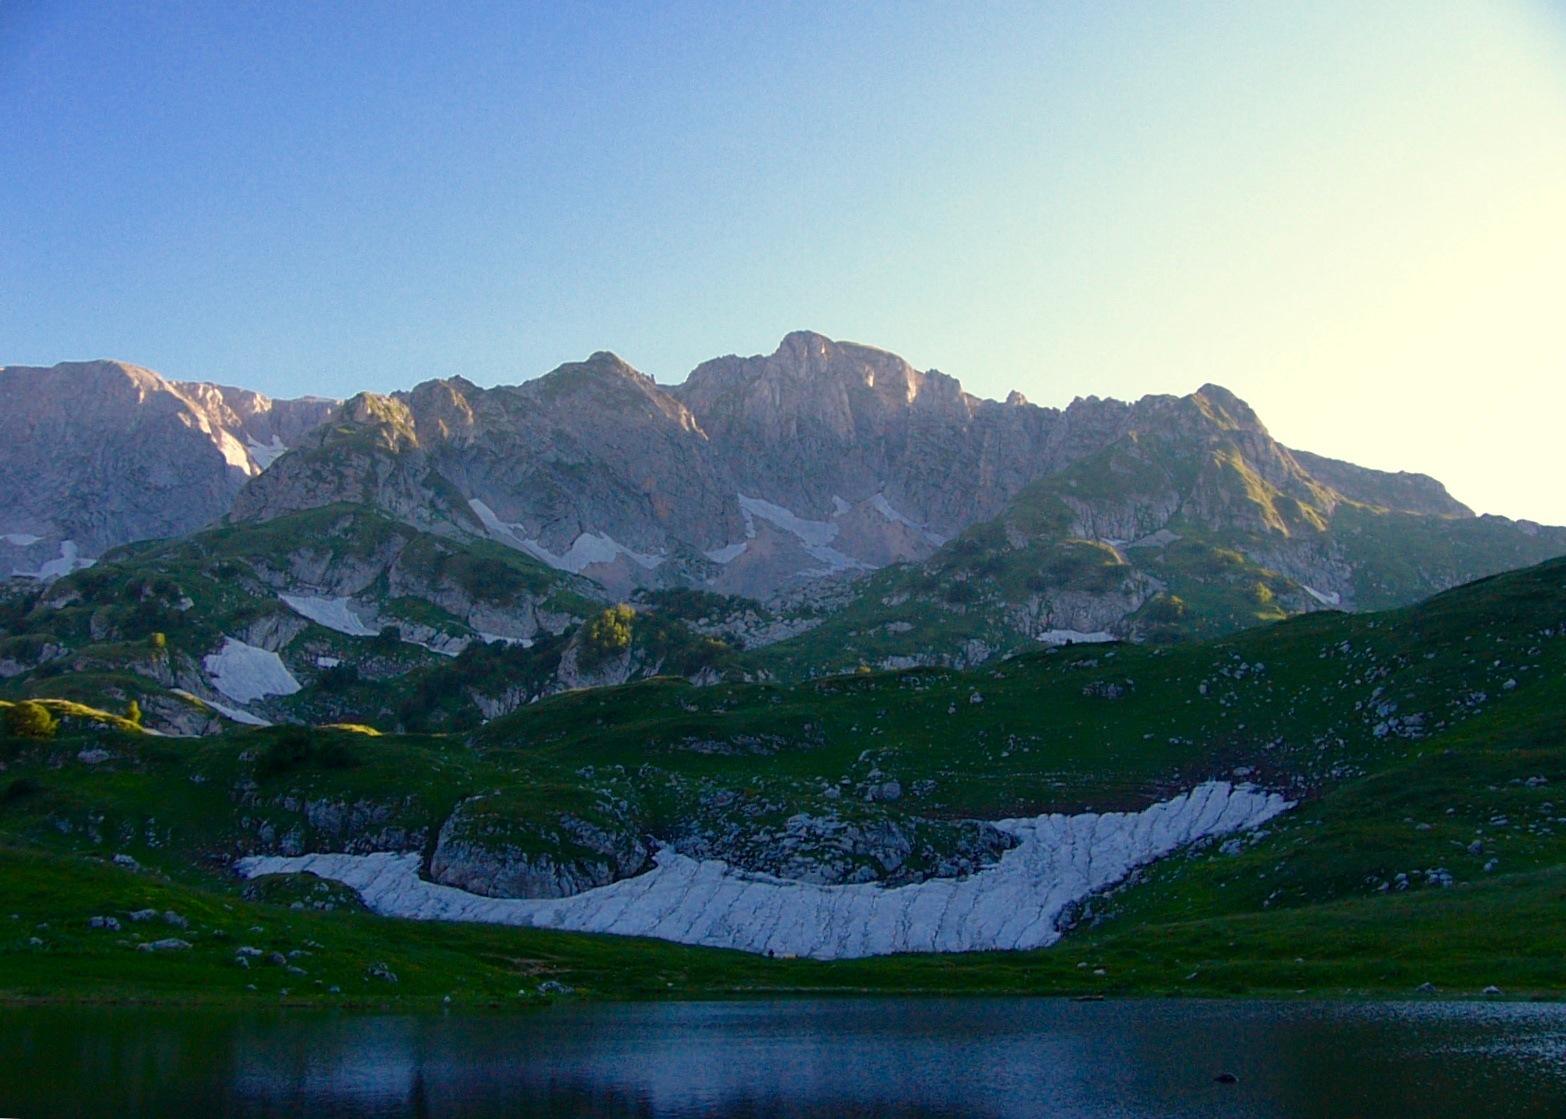 Mount Oshten and Psenodah lake in 2007. Smiles to you) by Egor Koshkin